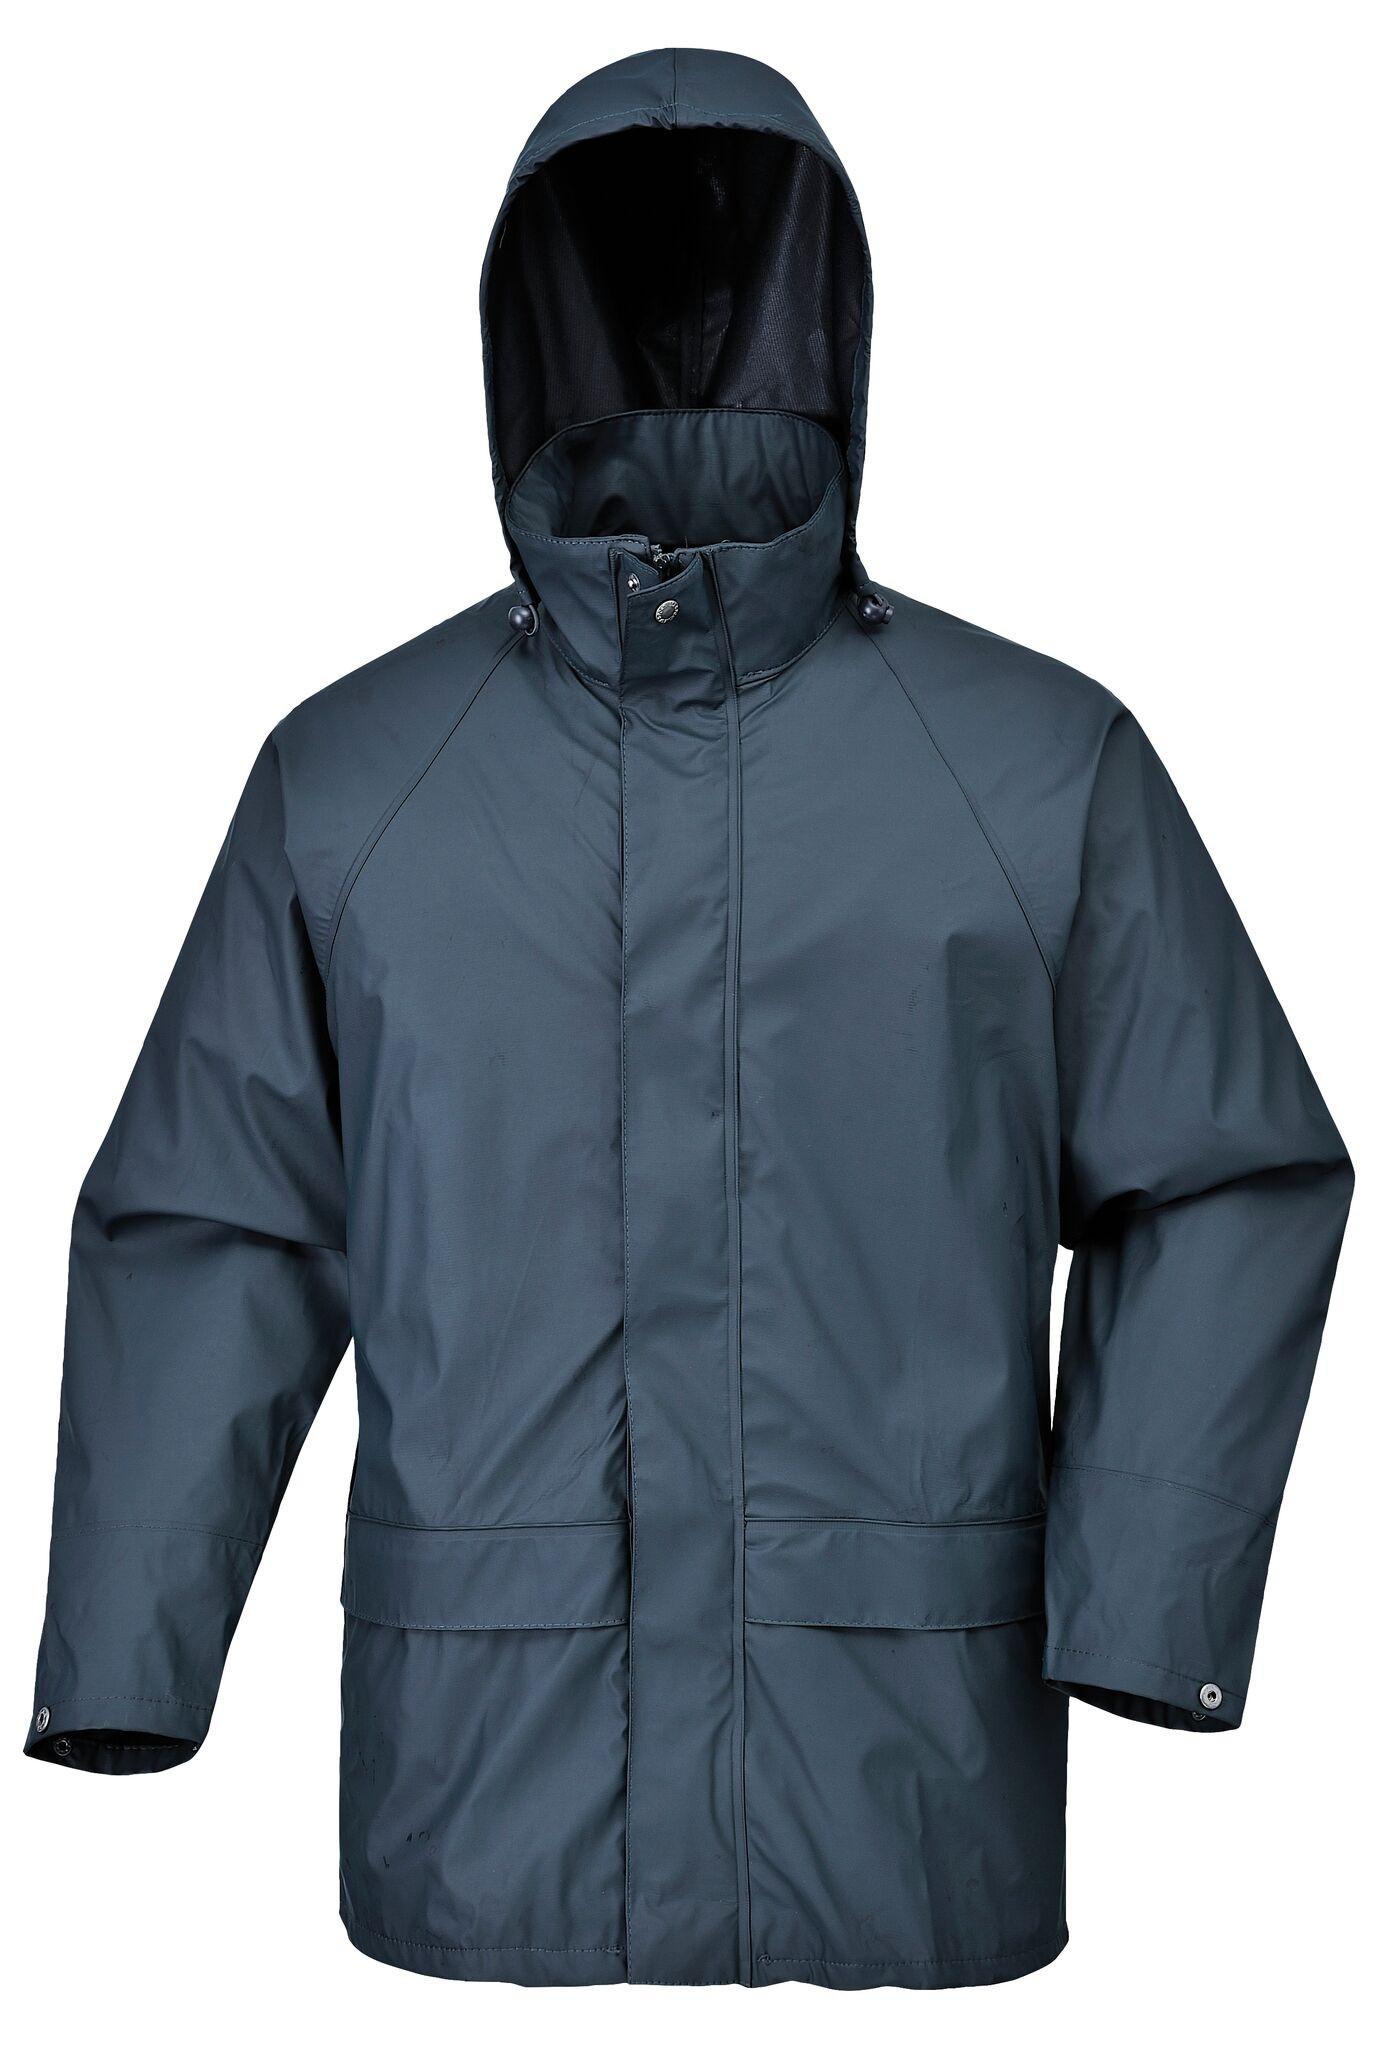 Sealtex Air Jacket